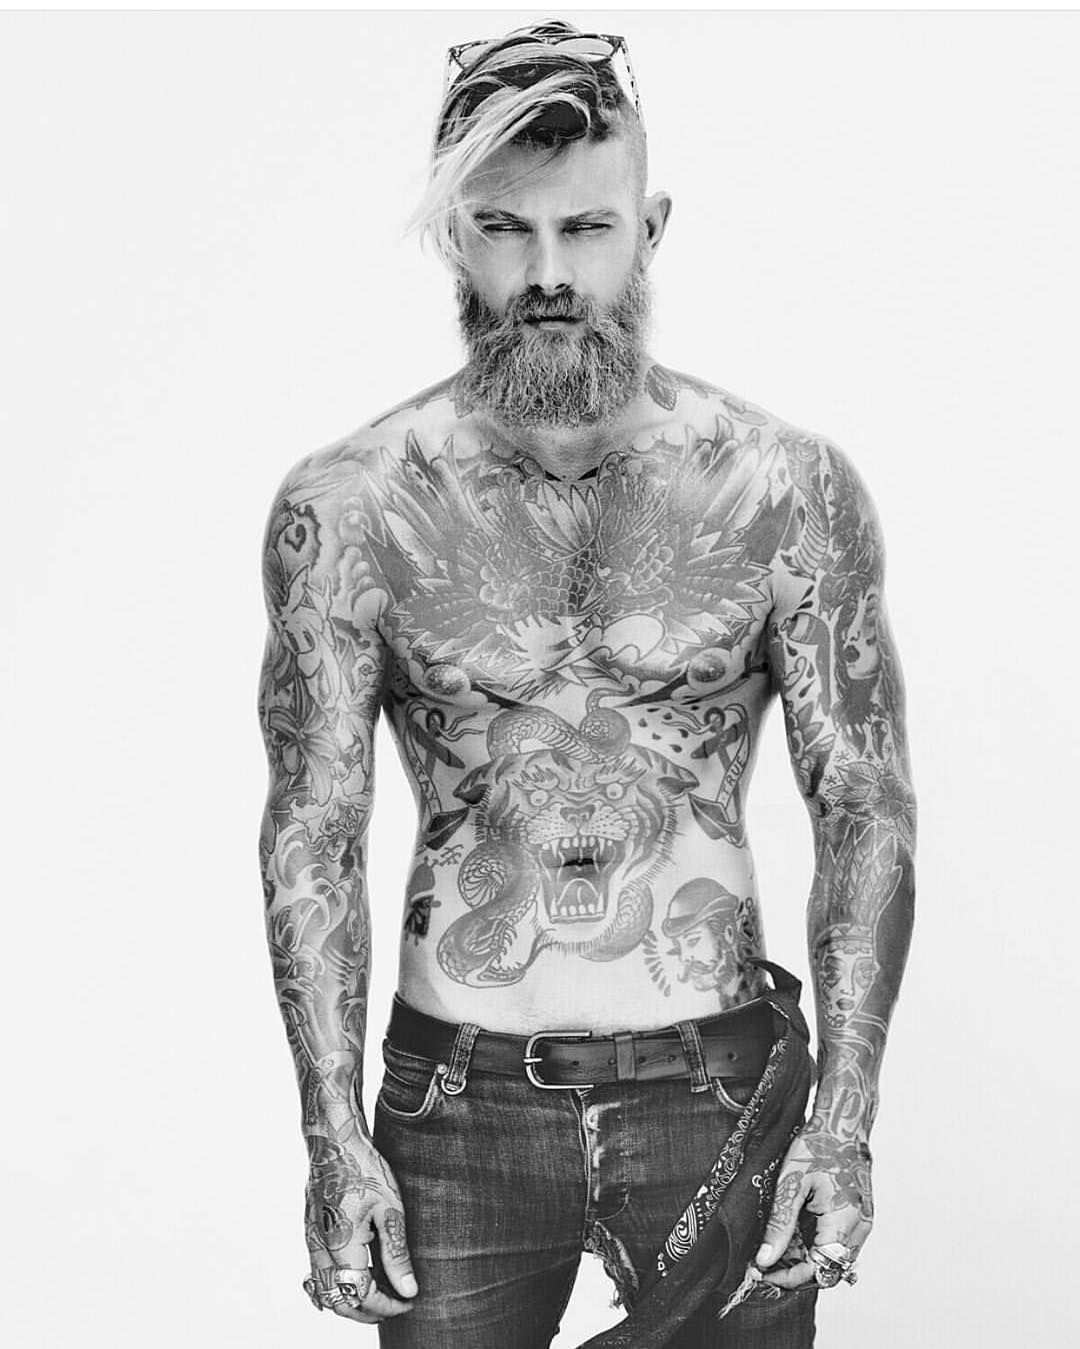 nasa guy with tattoos - HD1080×1349